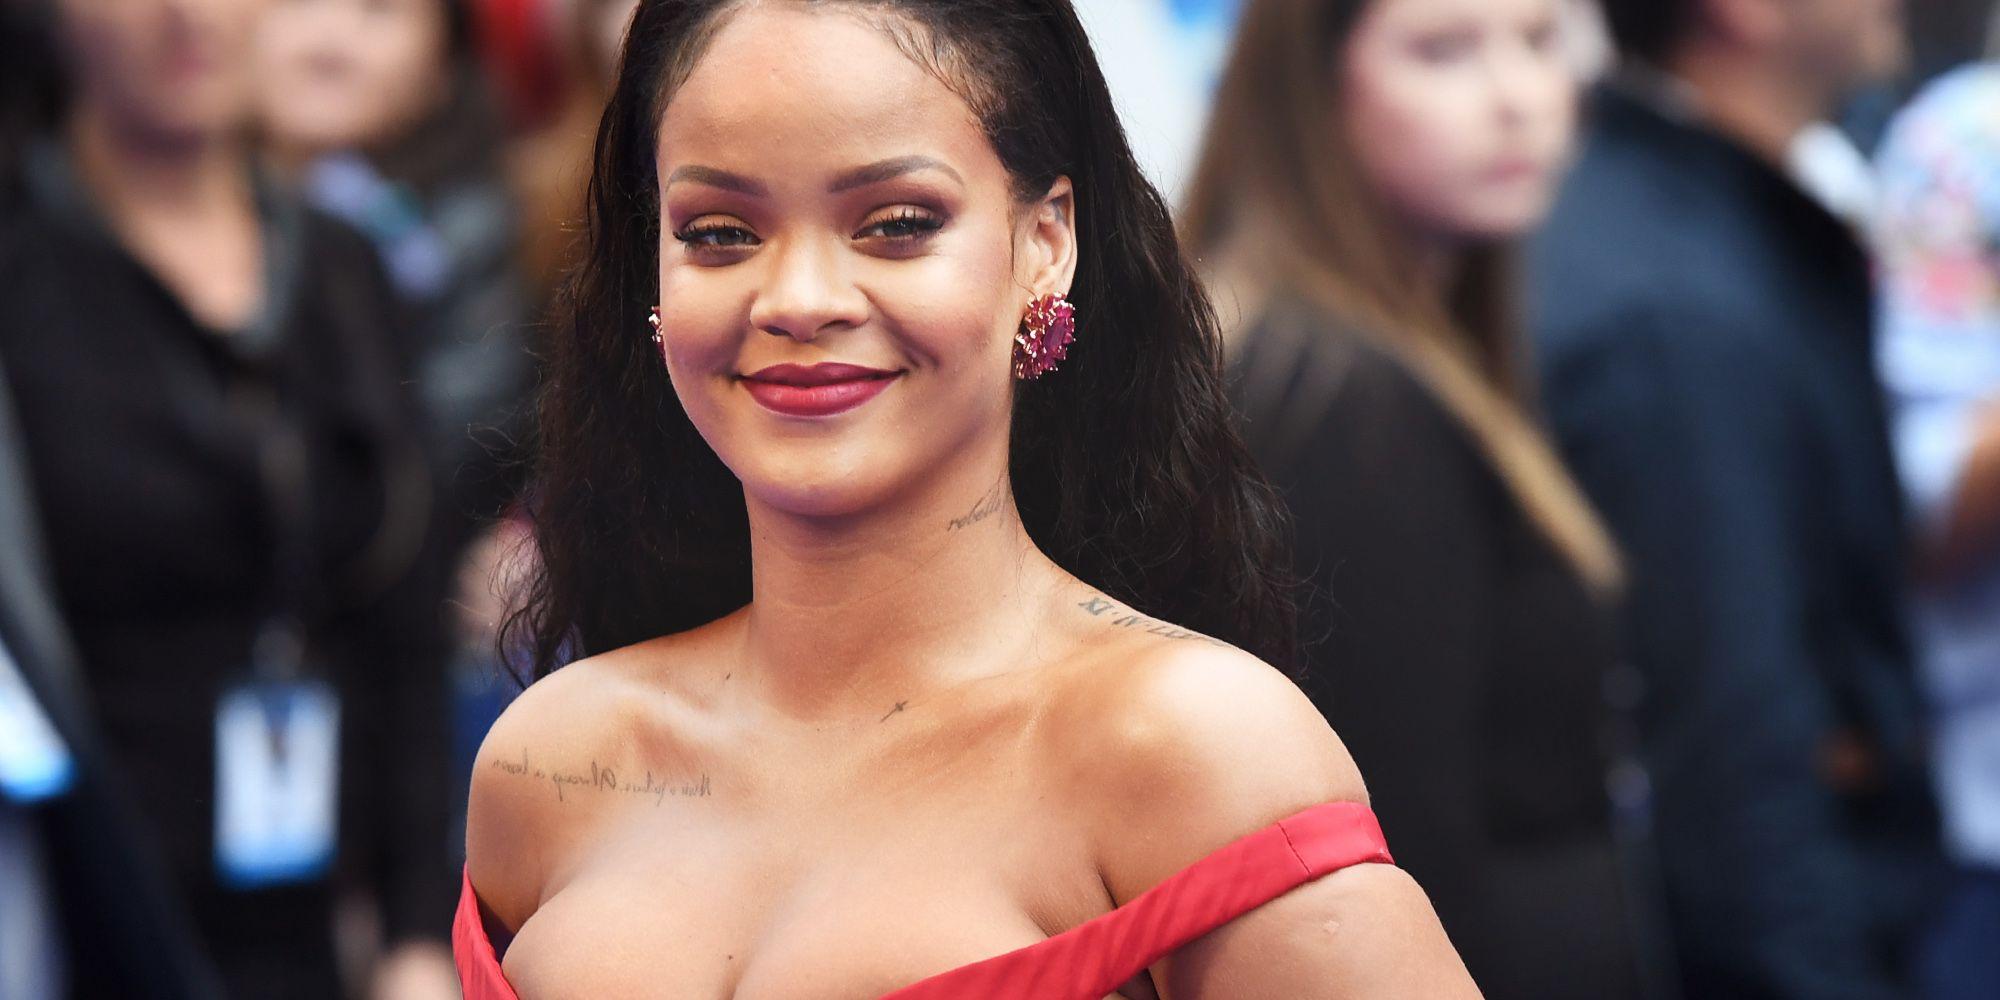 Rihanna Lingerie Launch Date